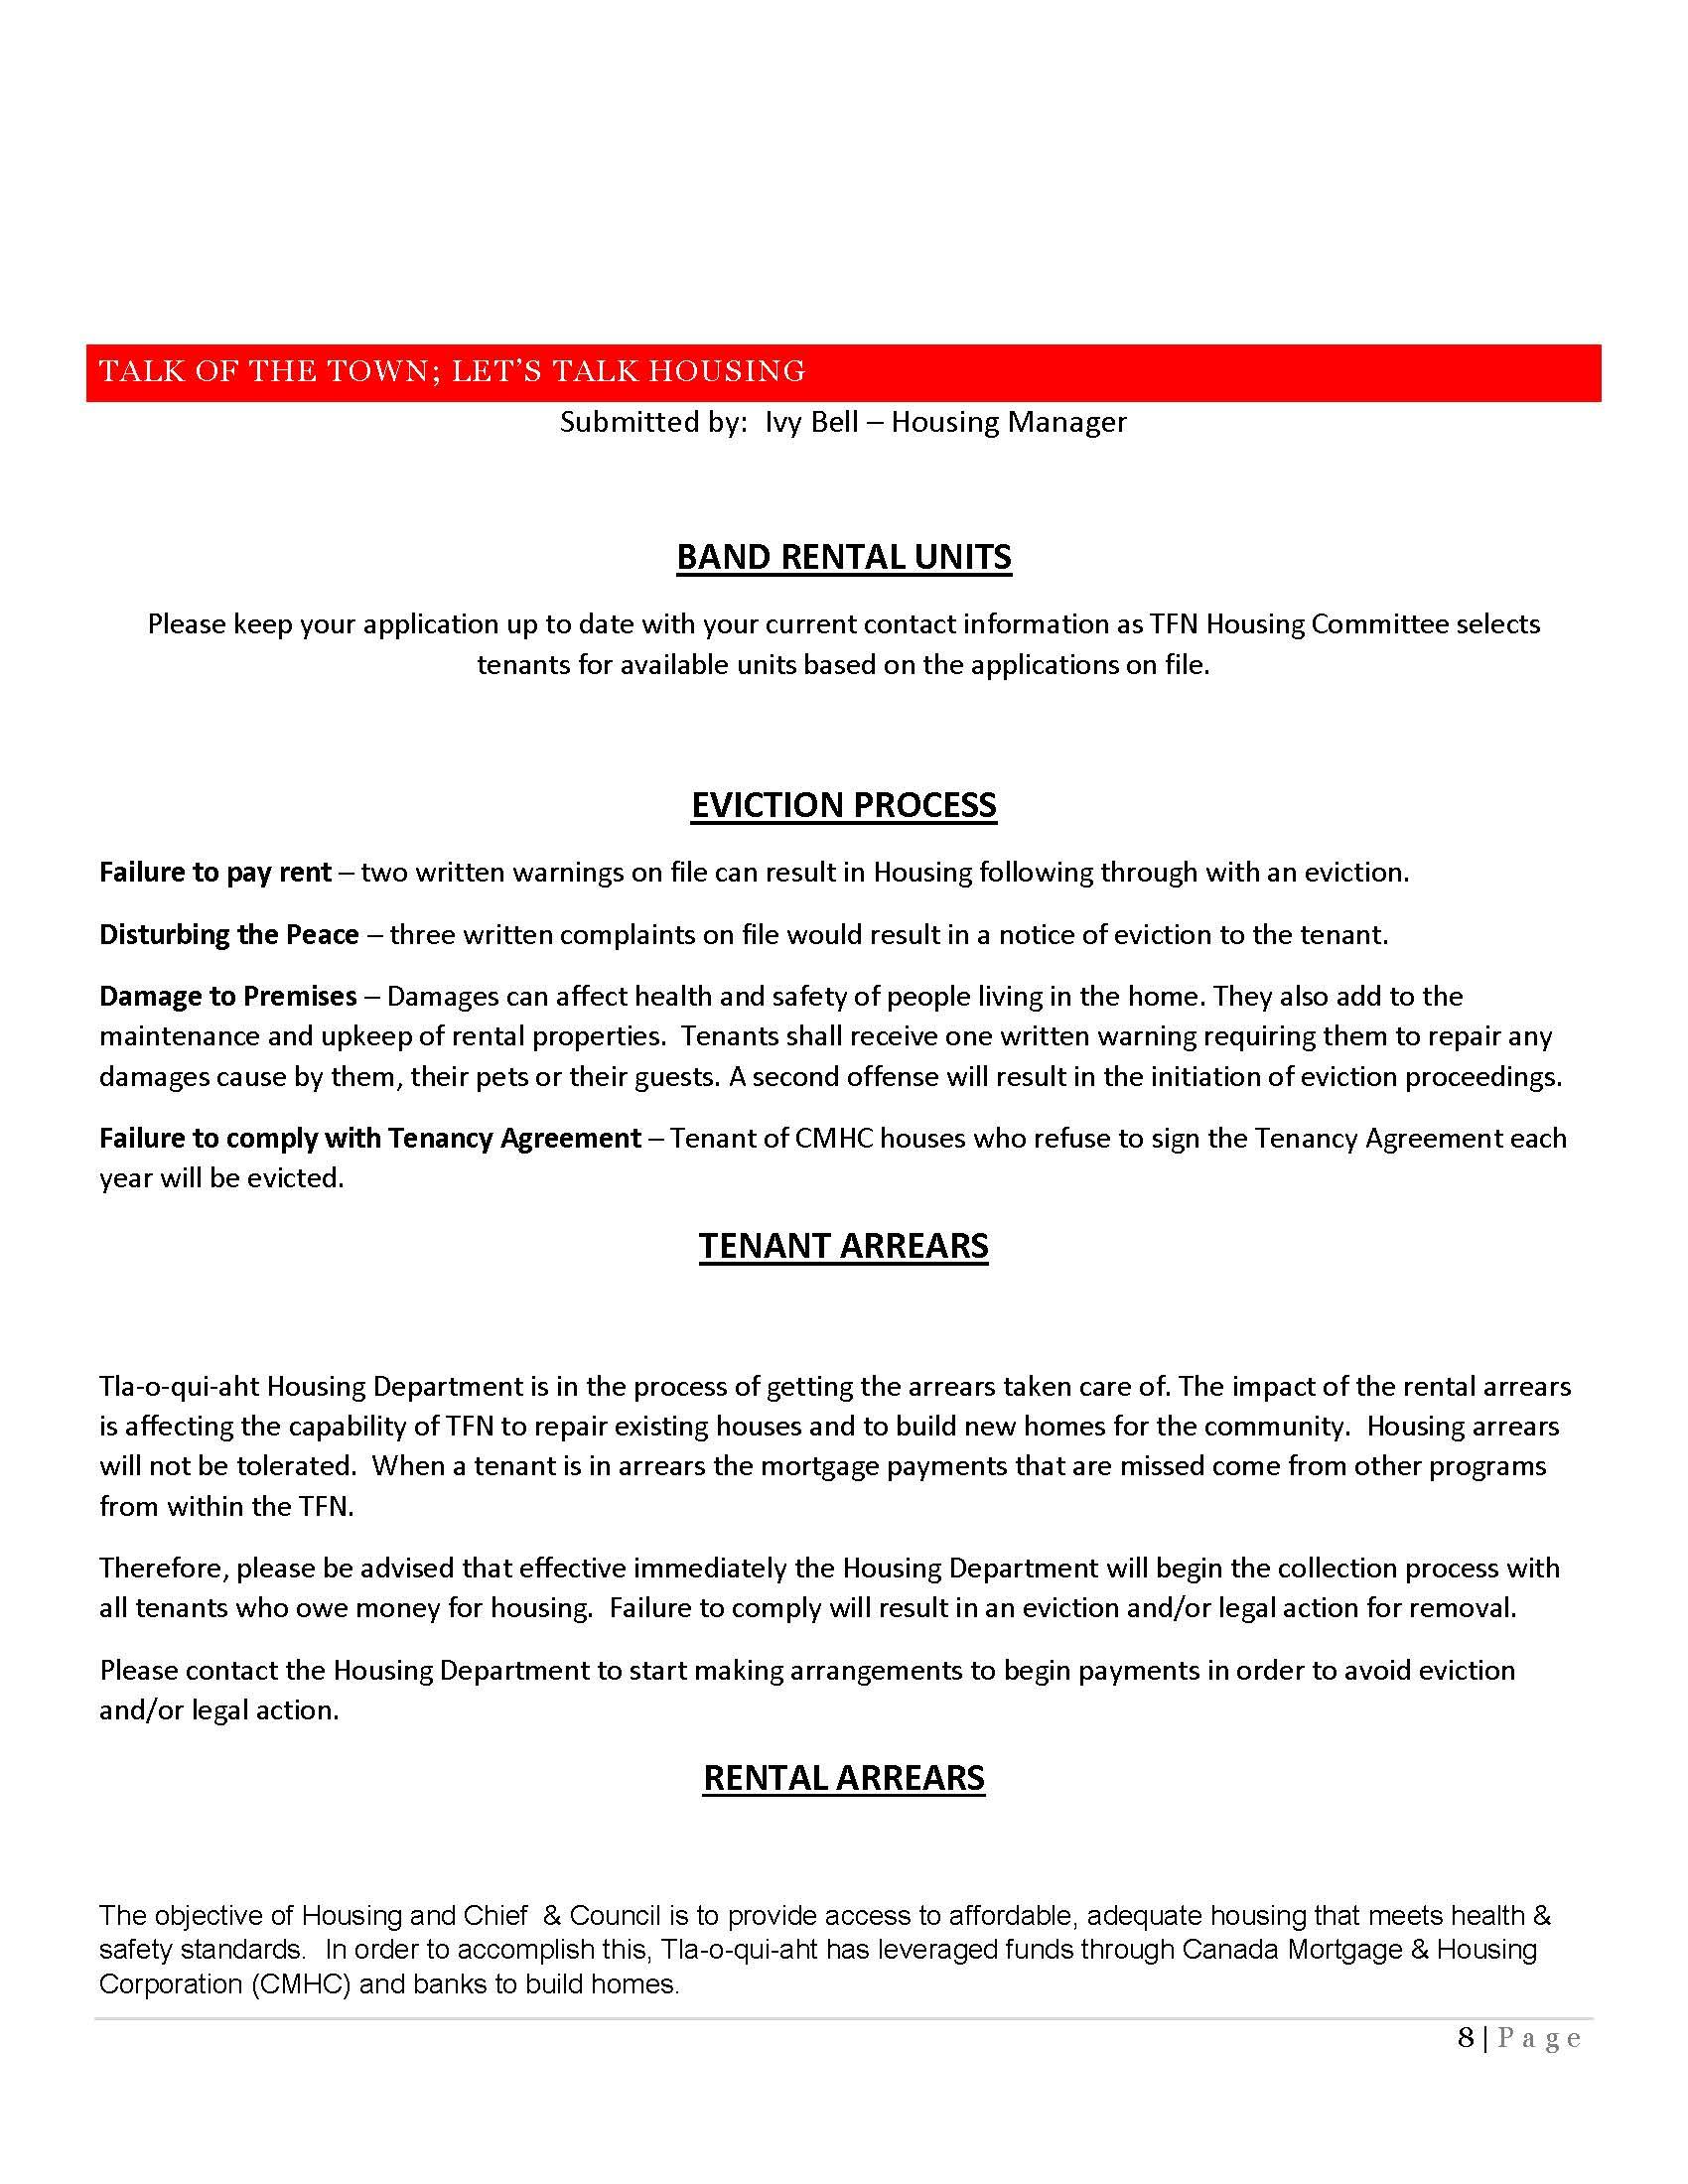 TFN Bulletin March 15-2017_Page_08.jpg